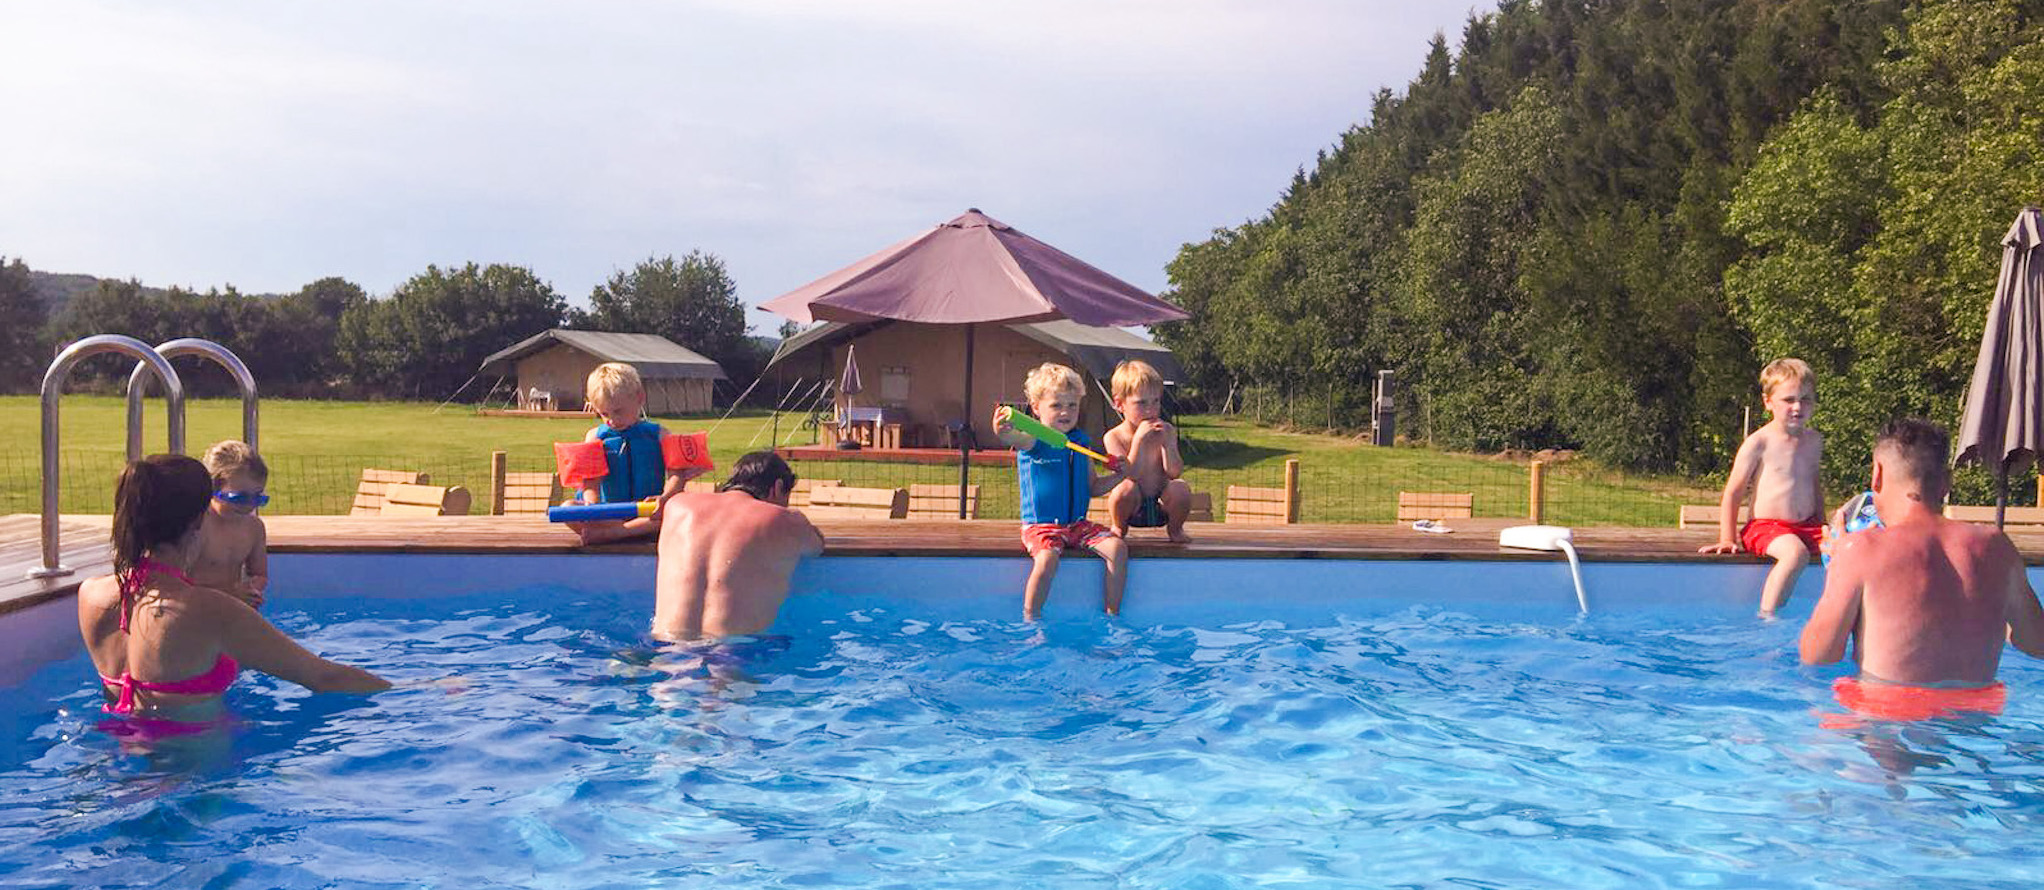 zwembad-Saint-Esselin-glamping-midi-pyreneeen